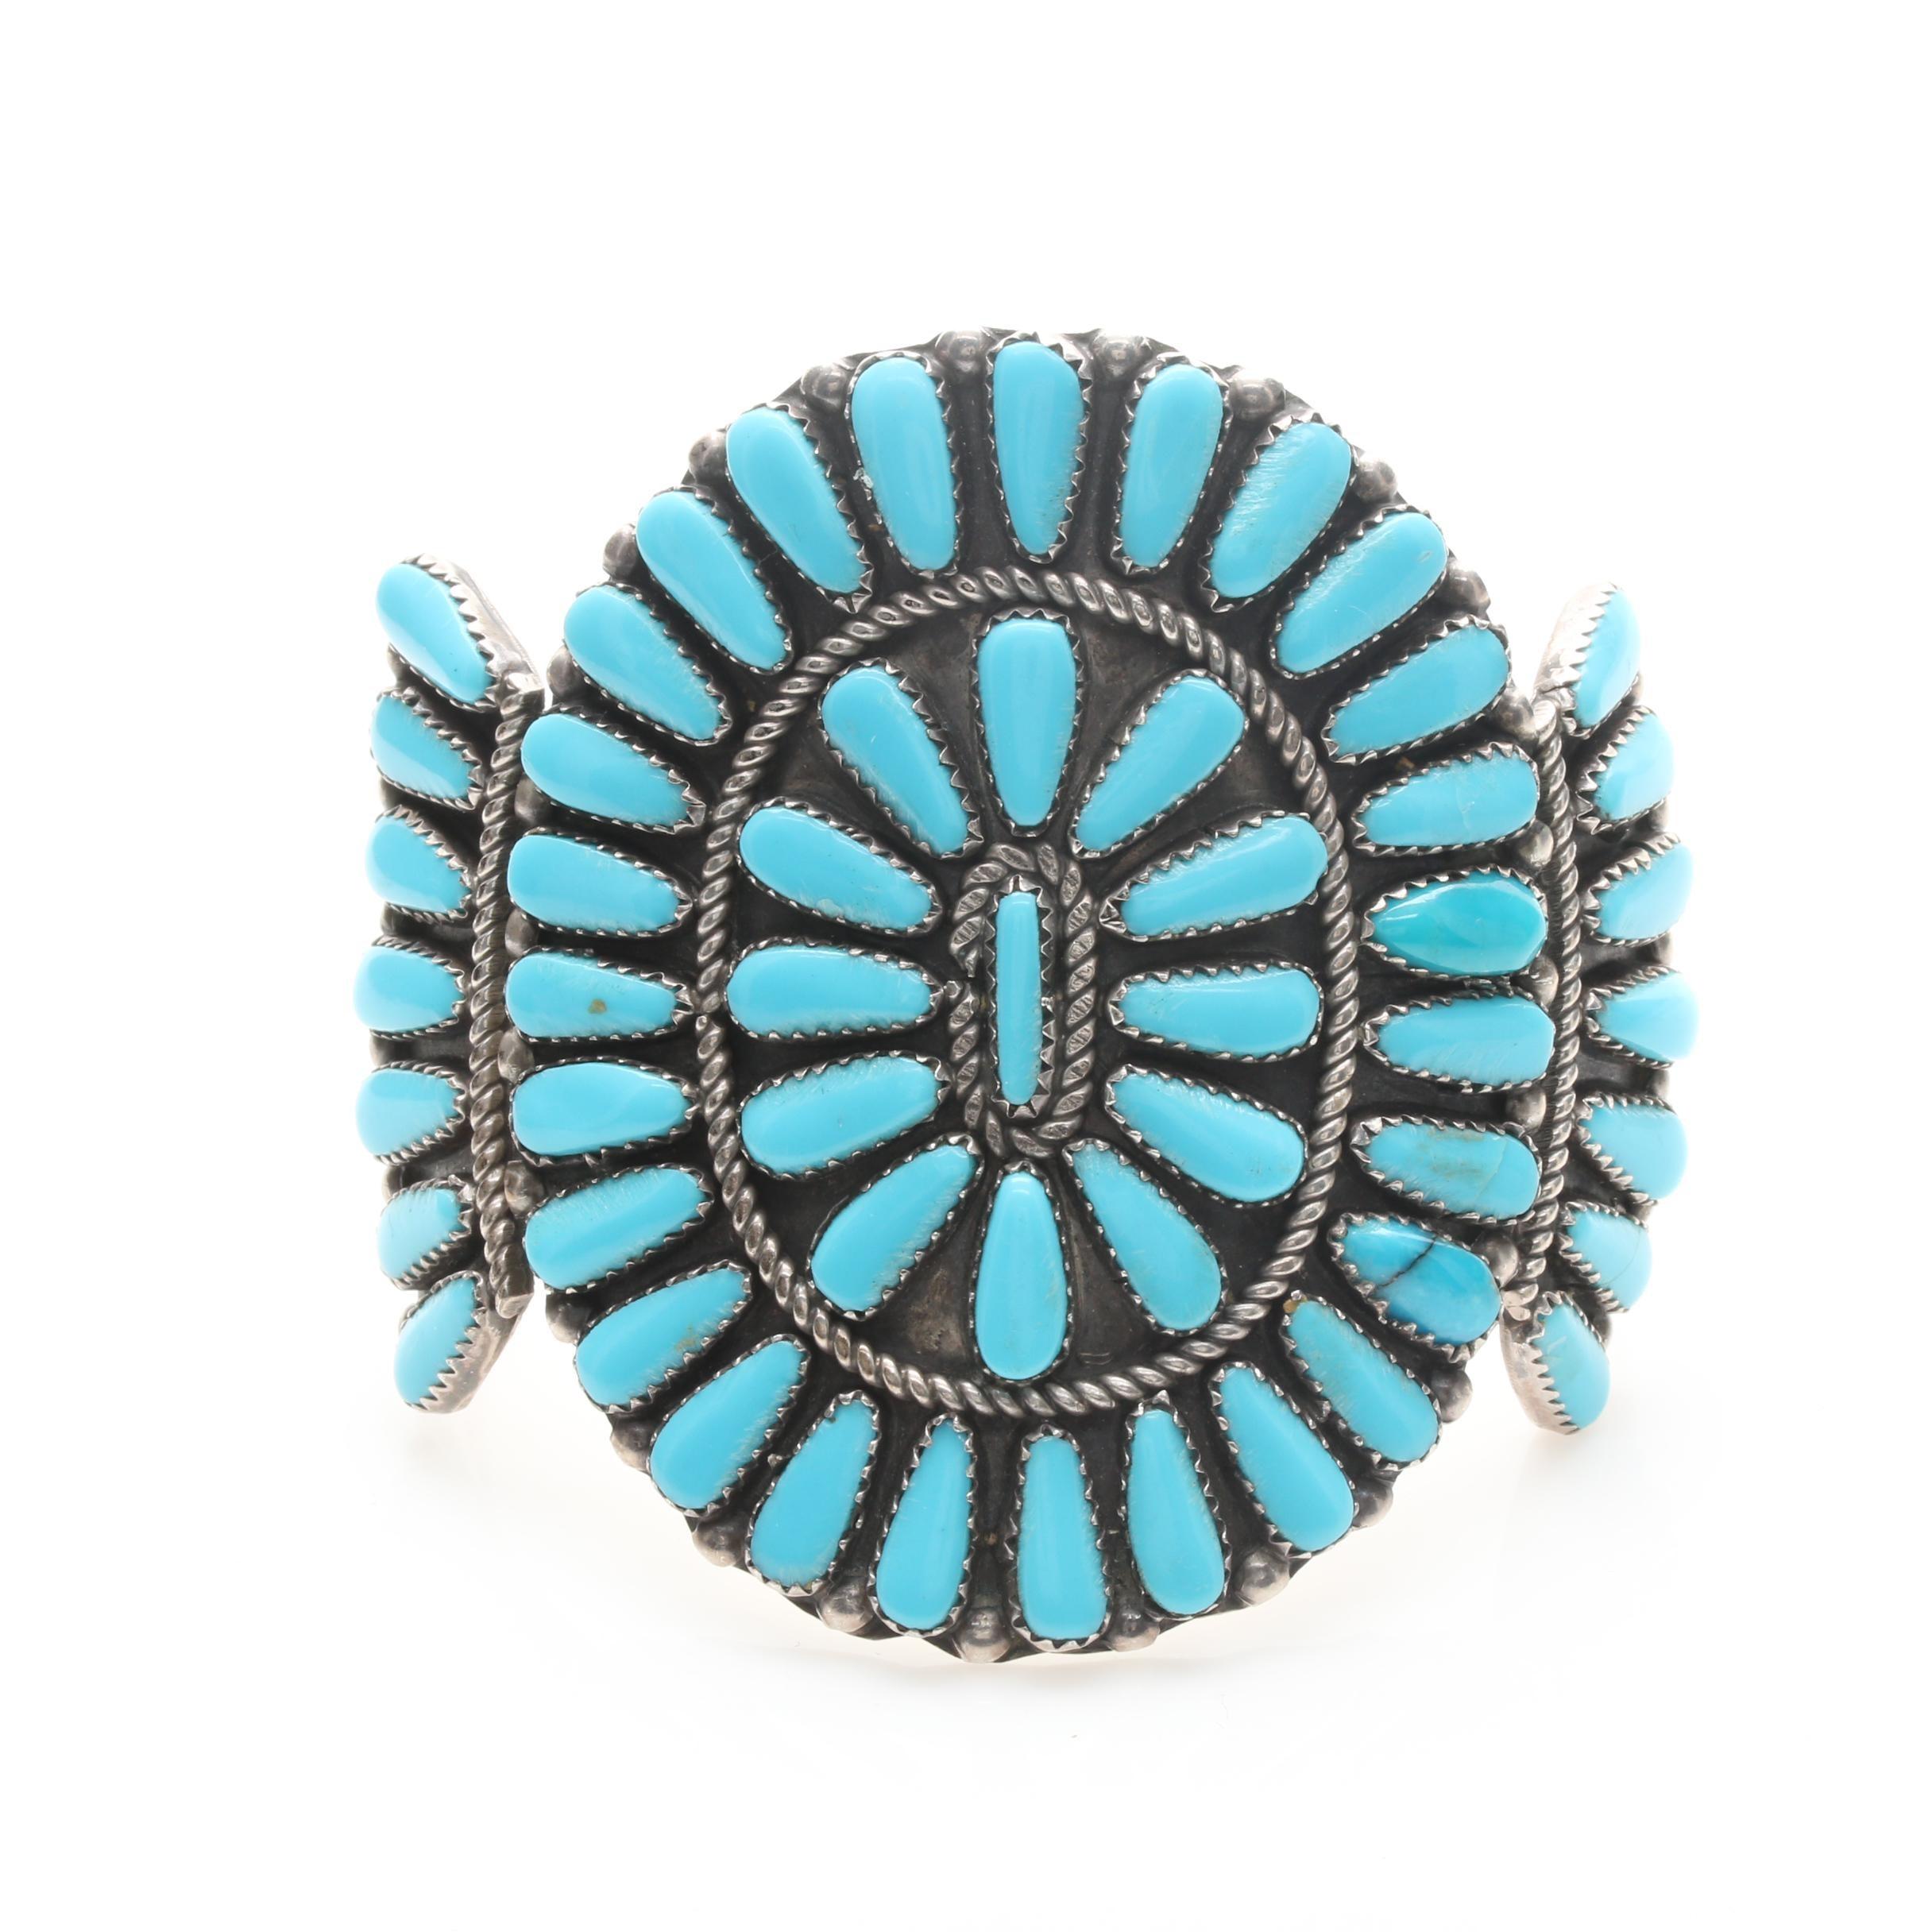 John Jim Billie Navajo Diné Sterling Silver Stabilized Turquoise Cuff Bracelet